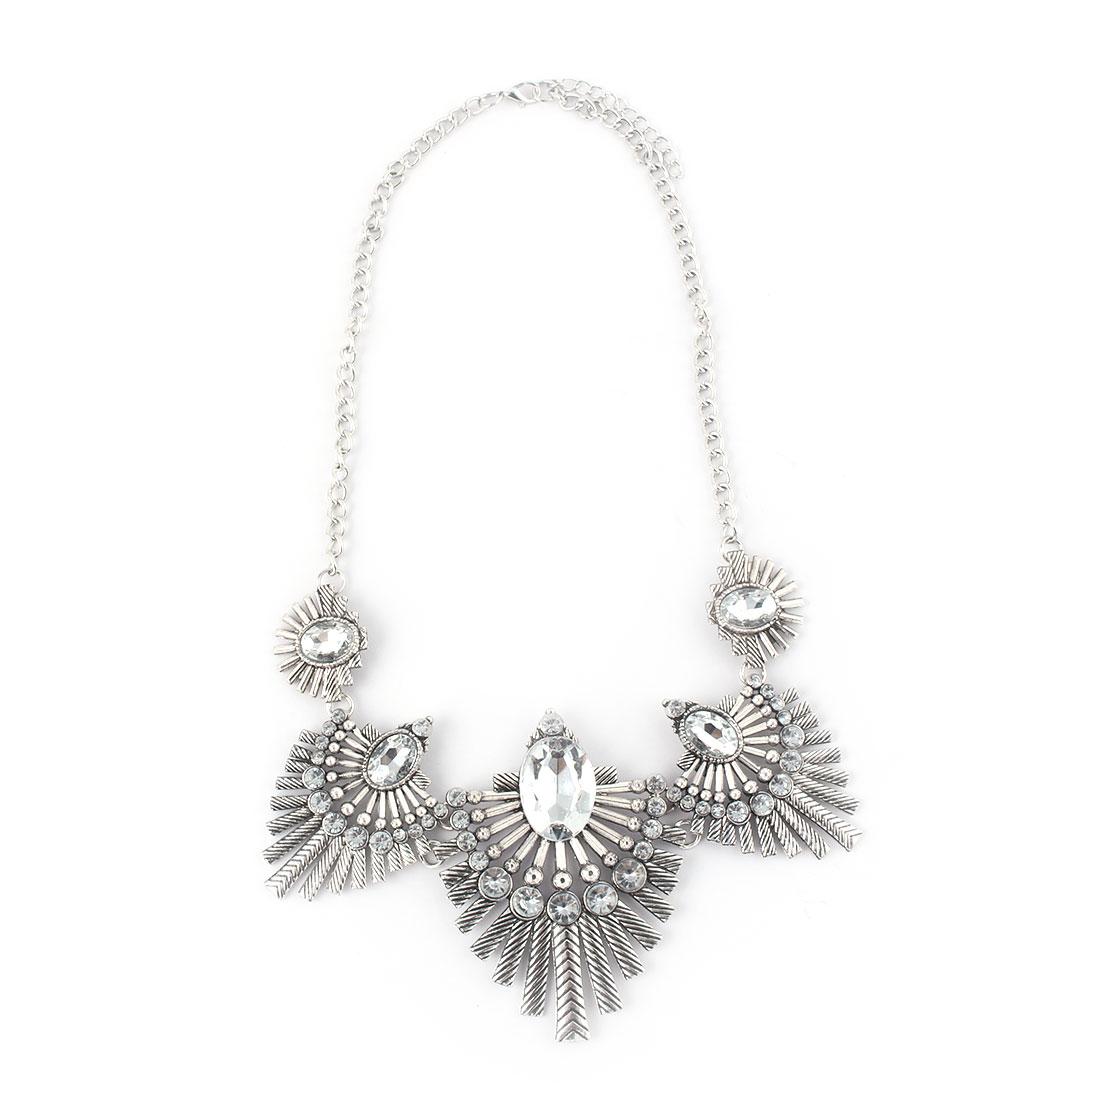 Women Metal Leaf Design Faux Rhinestone Inlaid Pendant Bib Collar Charming Choker Necklace White Silver Tone